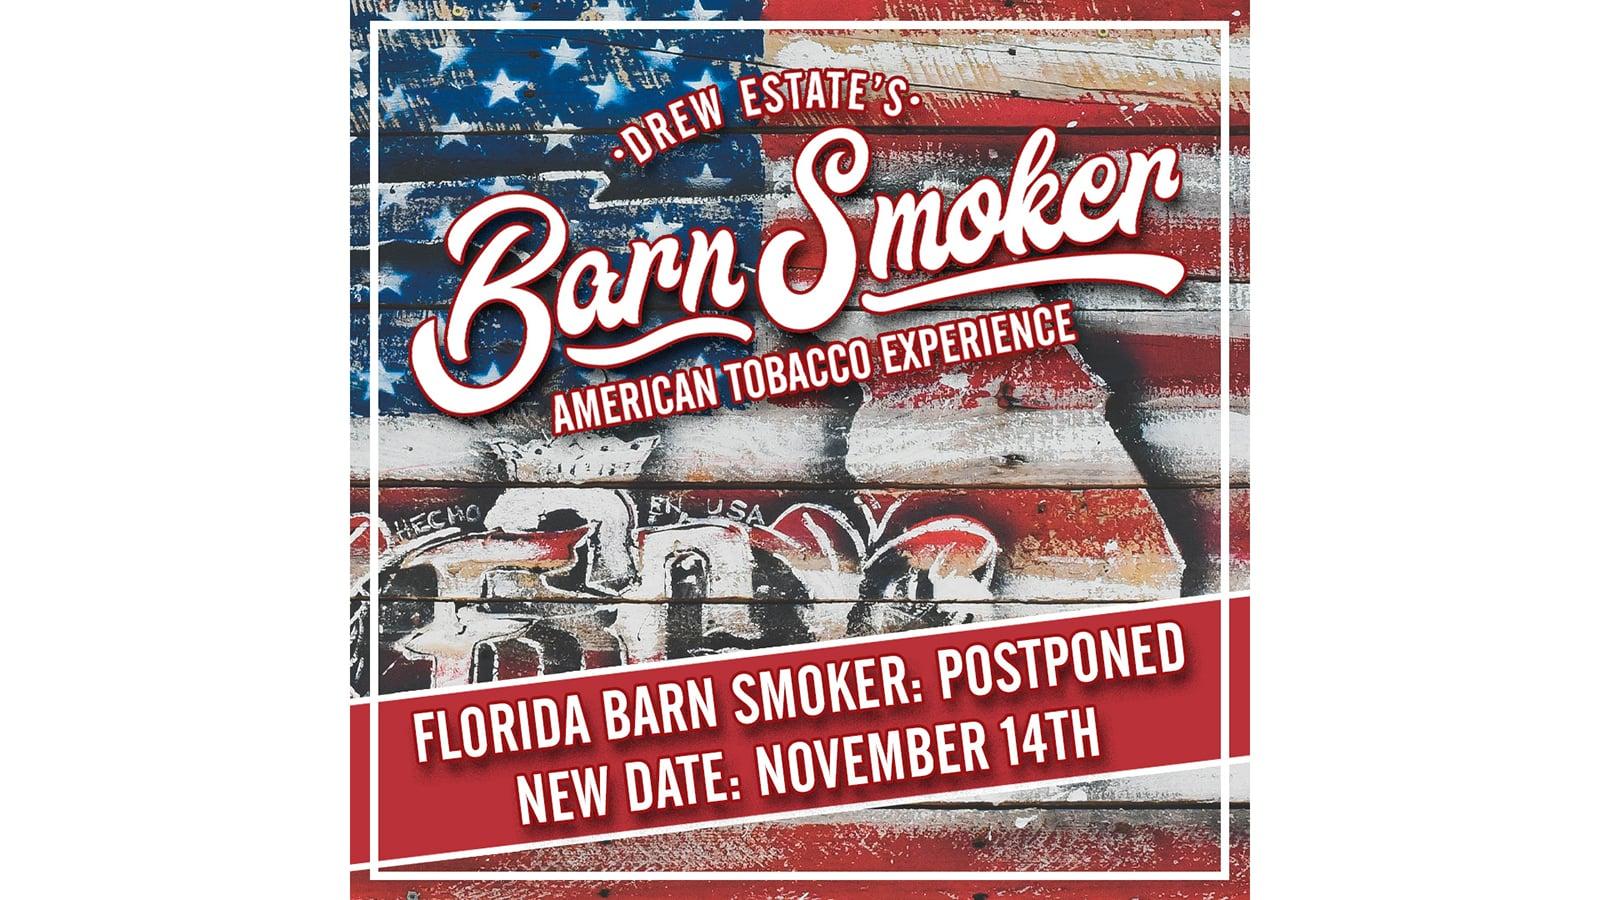 Drew Estate Postpones Florida Barn Smoker